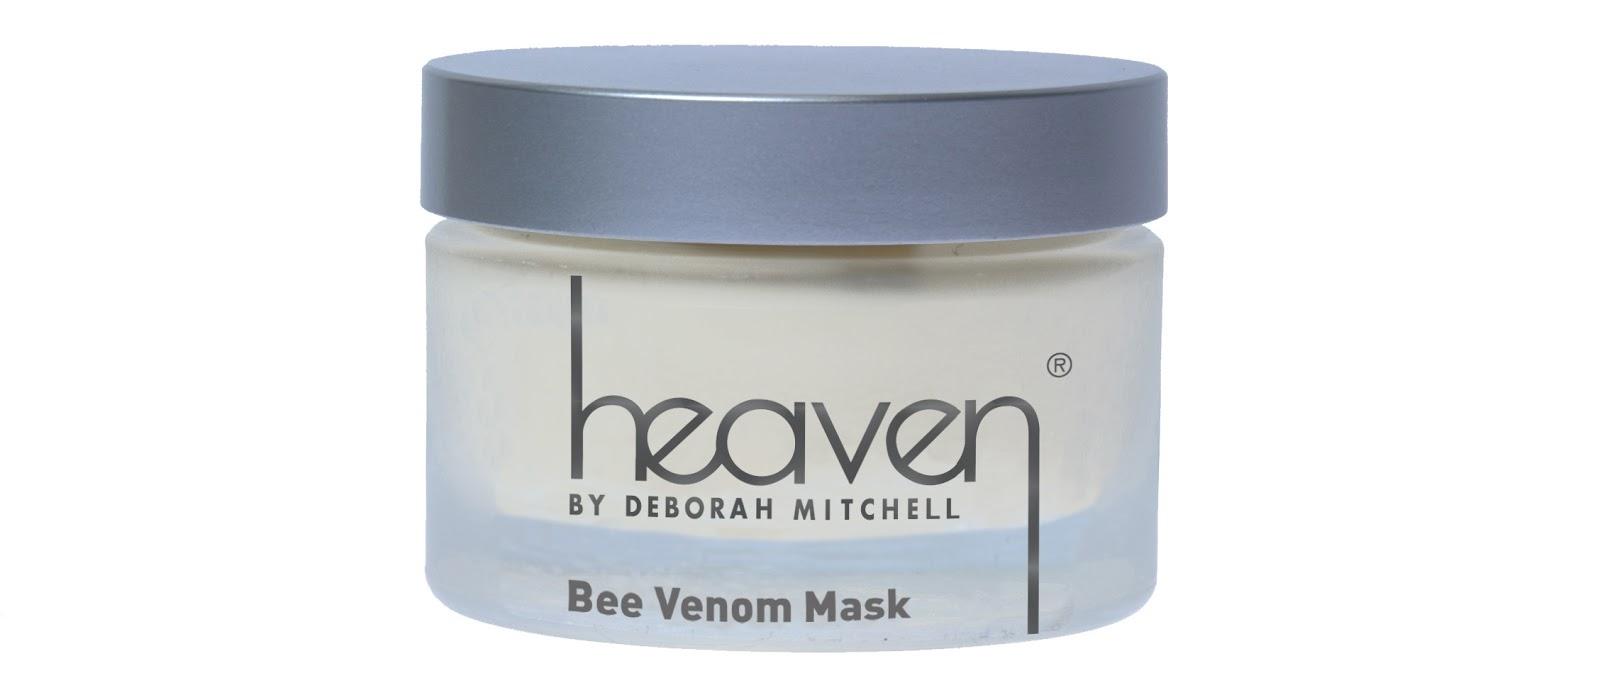 Heaven Bee Venom Mask